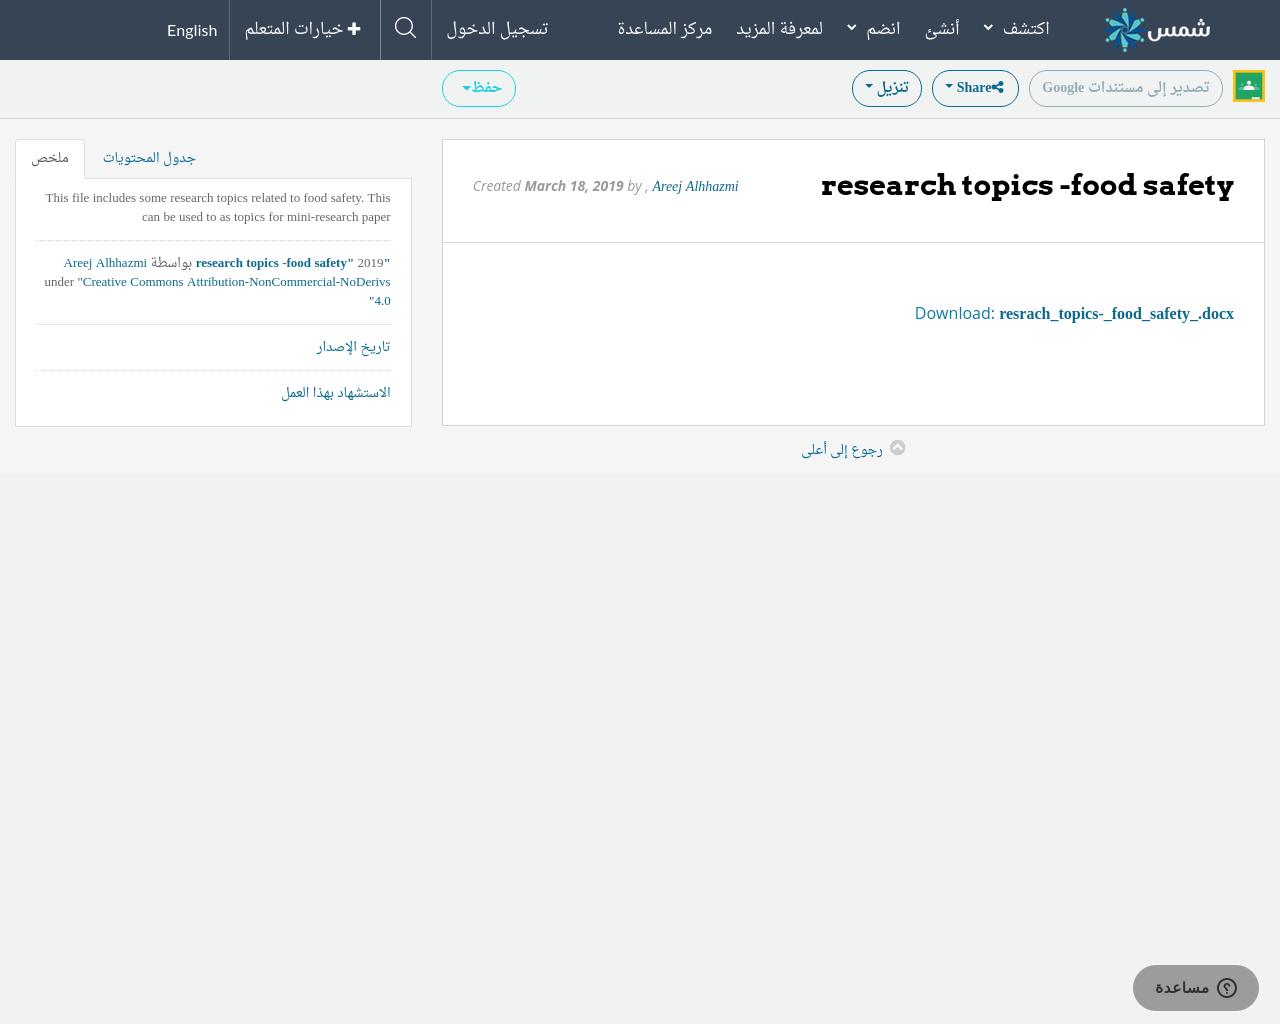 research topics -food safety | SHMS - Saudi OER Network